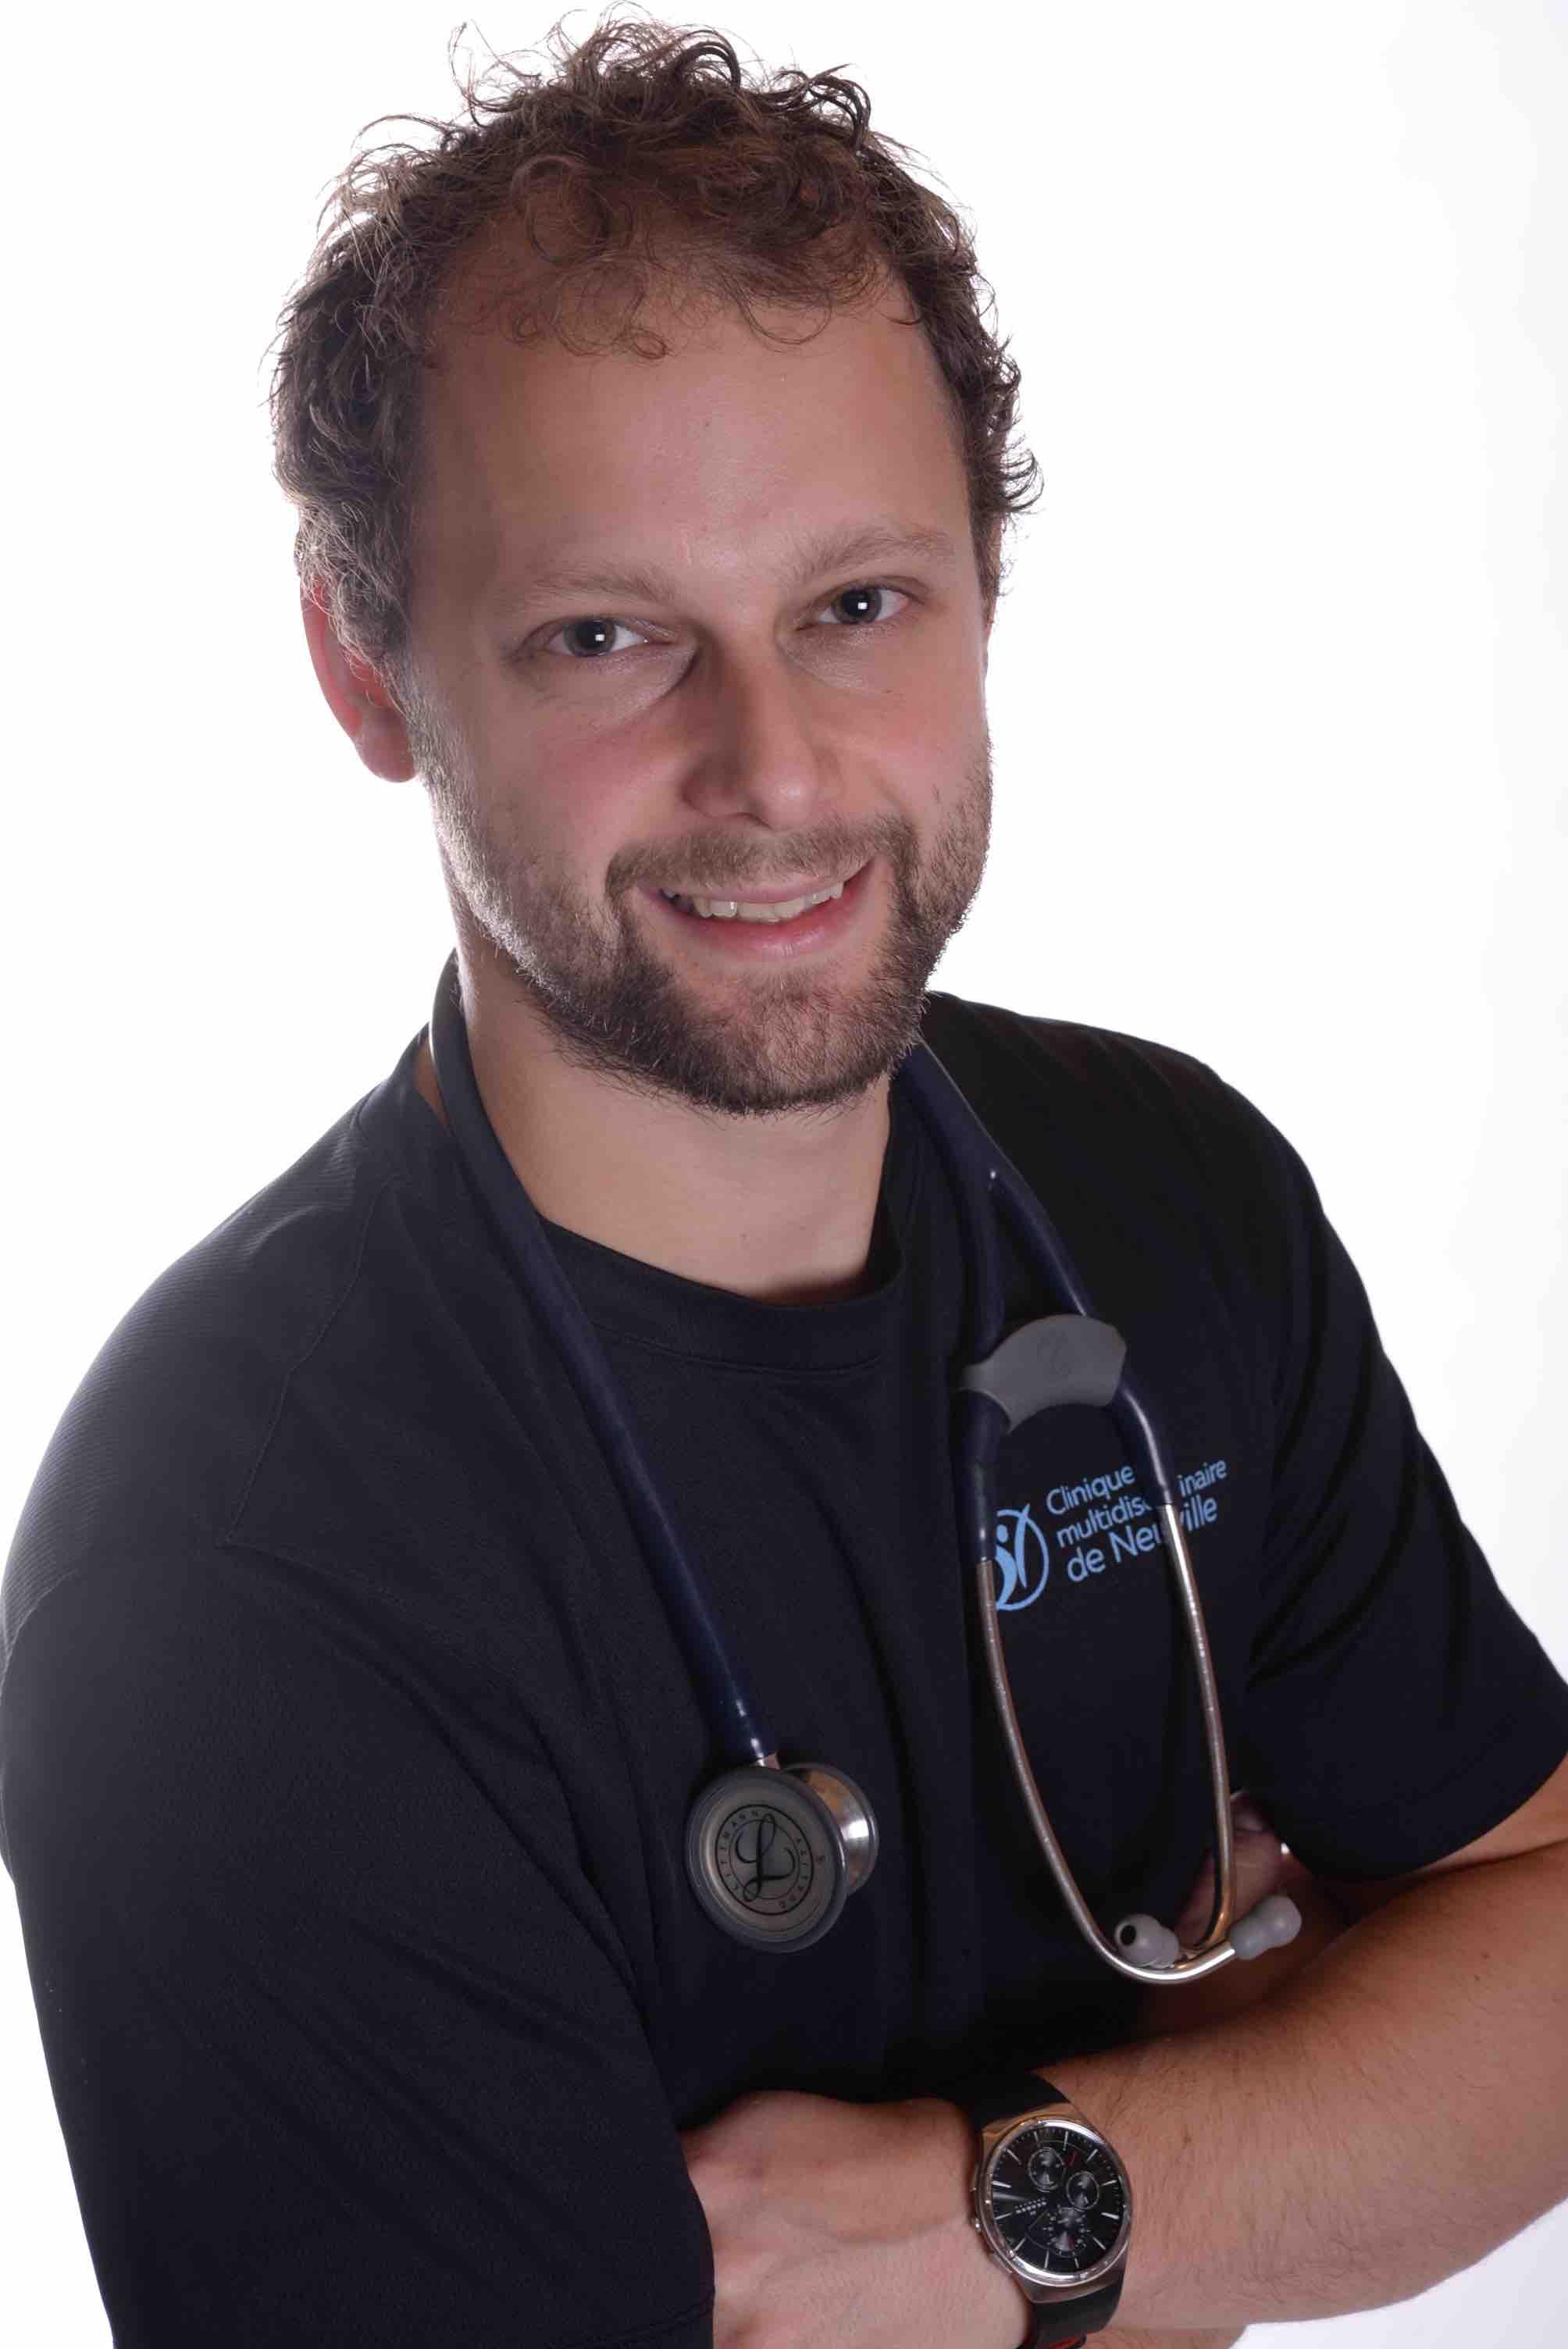 Joël Lavoie